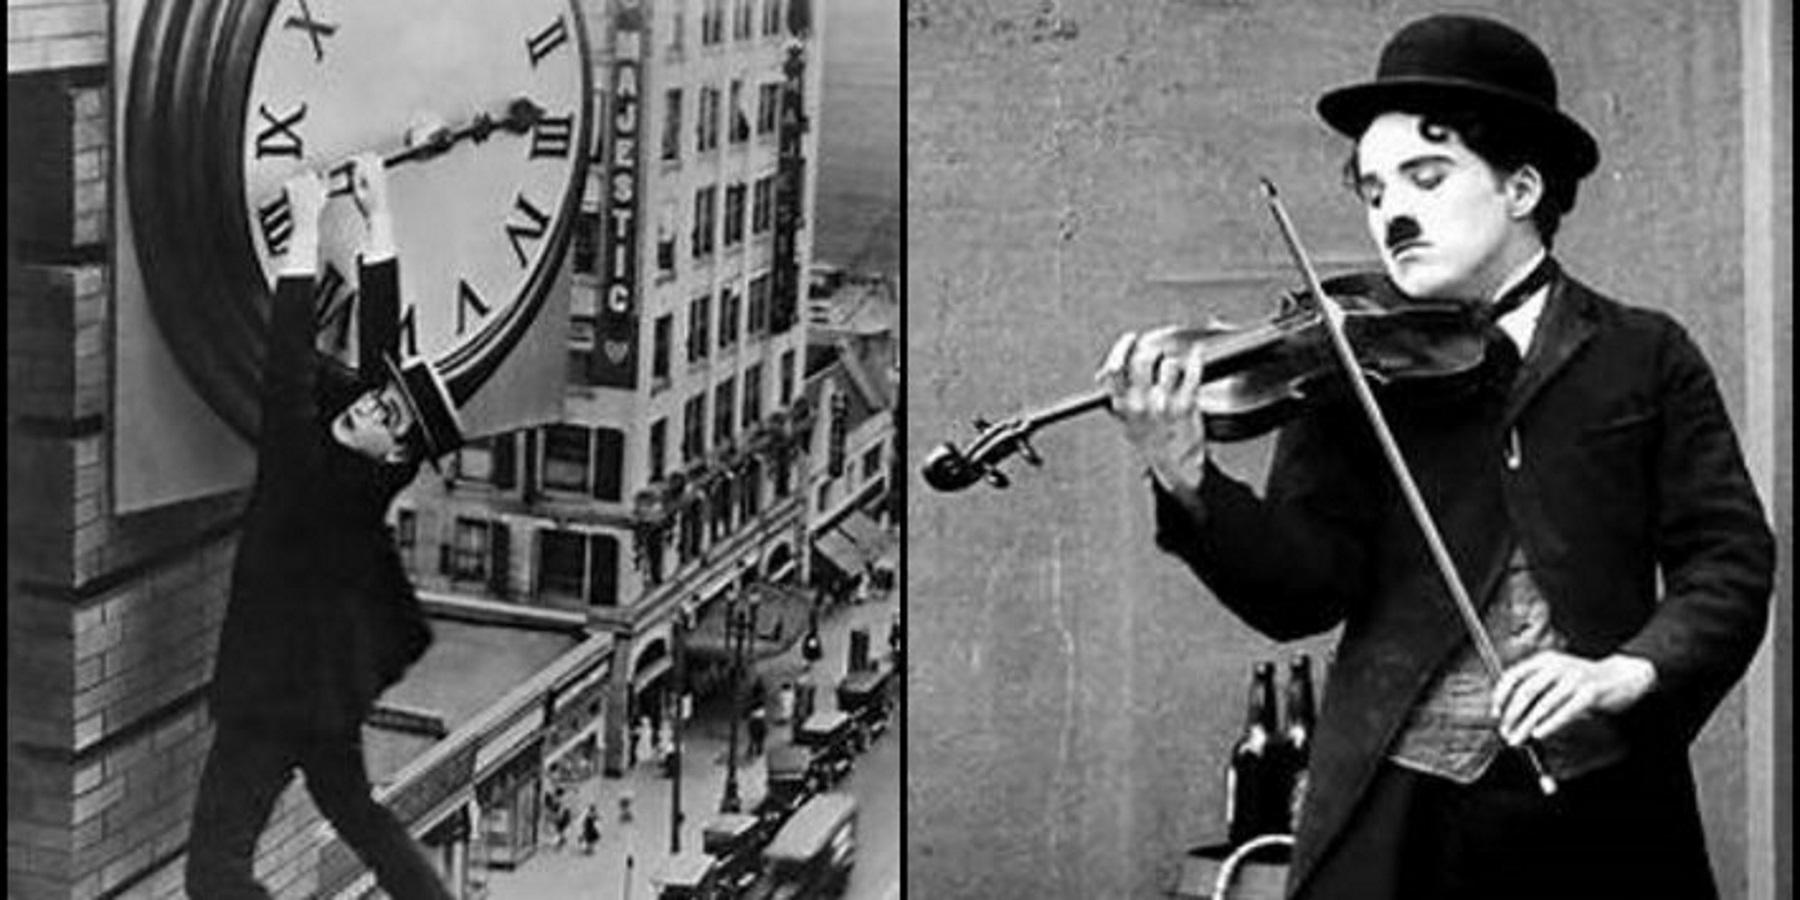 Buster Keaton and Charlie Chaplin